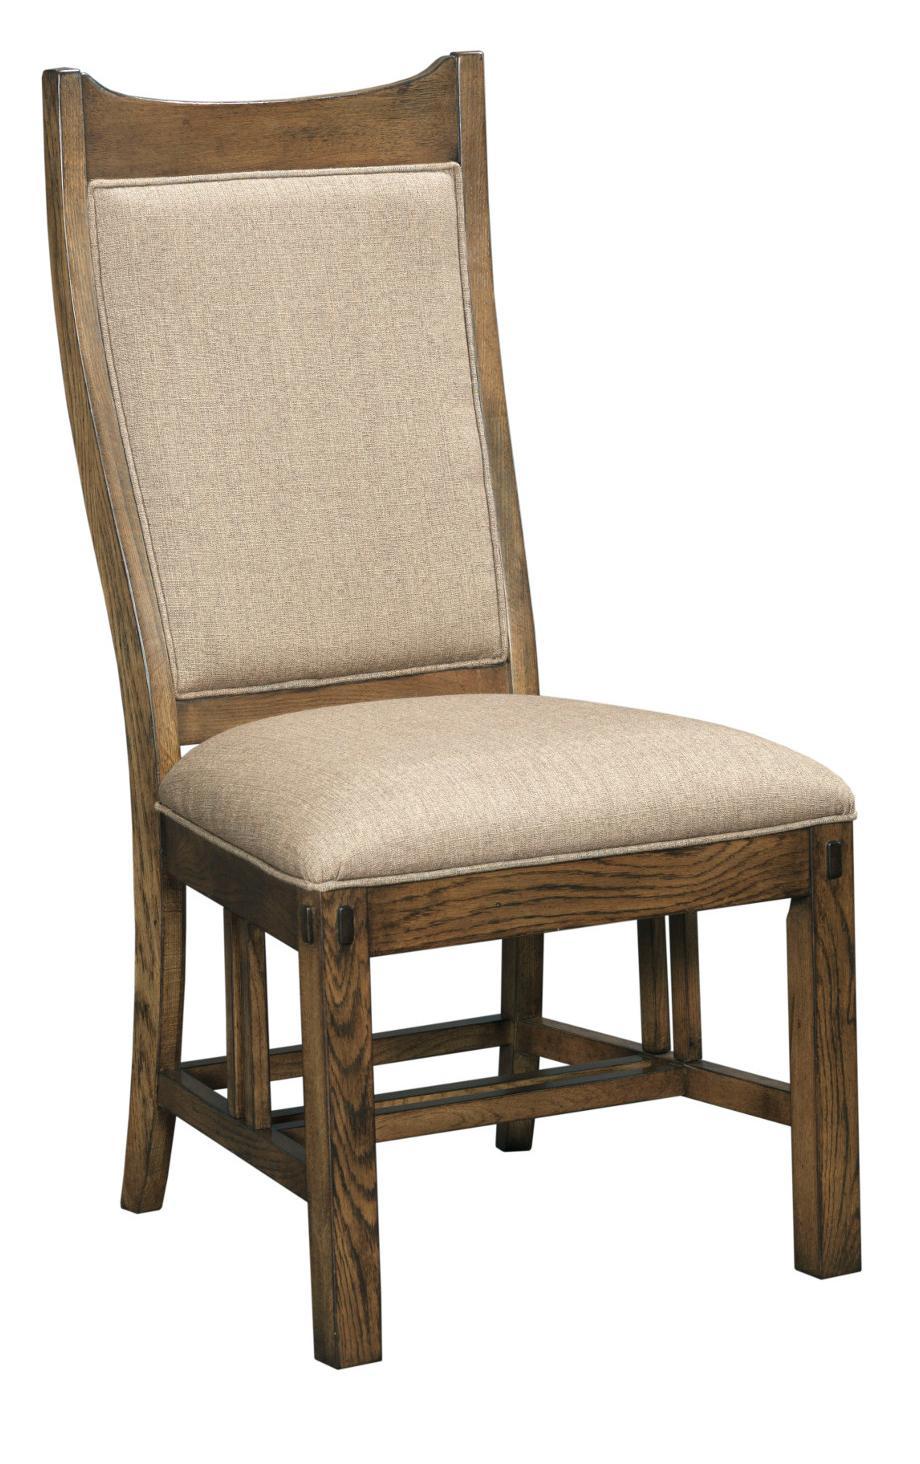 Kincaid Furniture Bedford Park Craftsman Side Chair - Item Number: 74-063